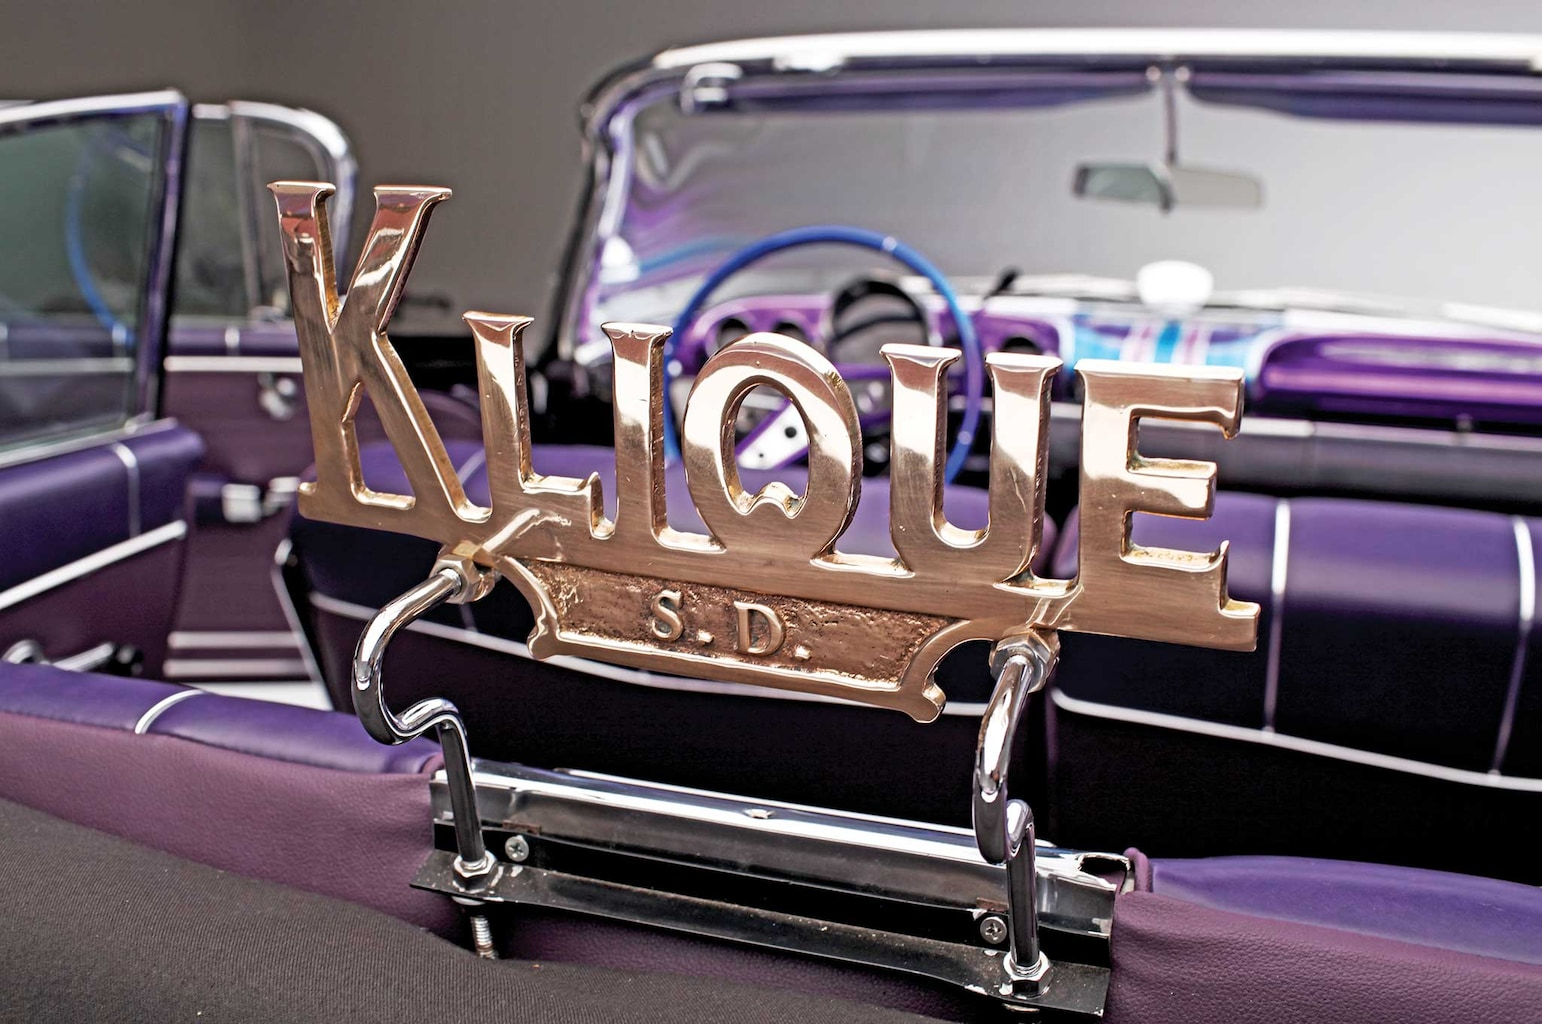 008 1959 chevrolet impala convertible klique club plaque